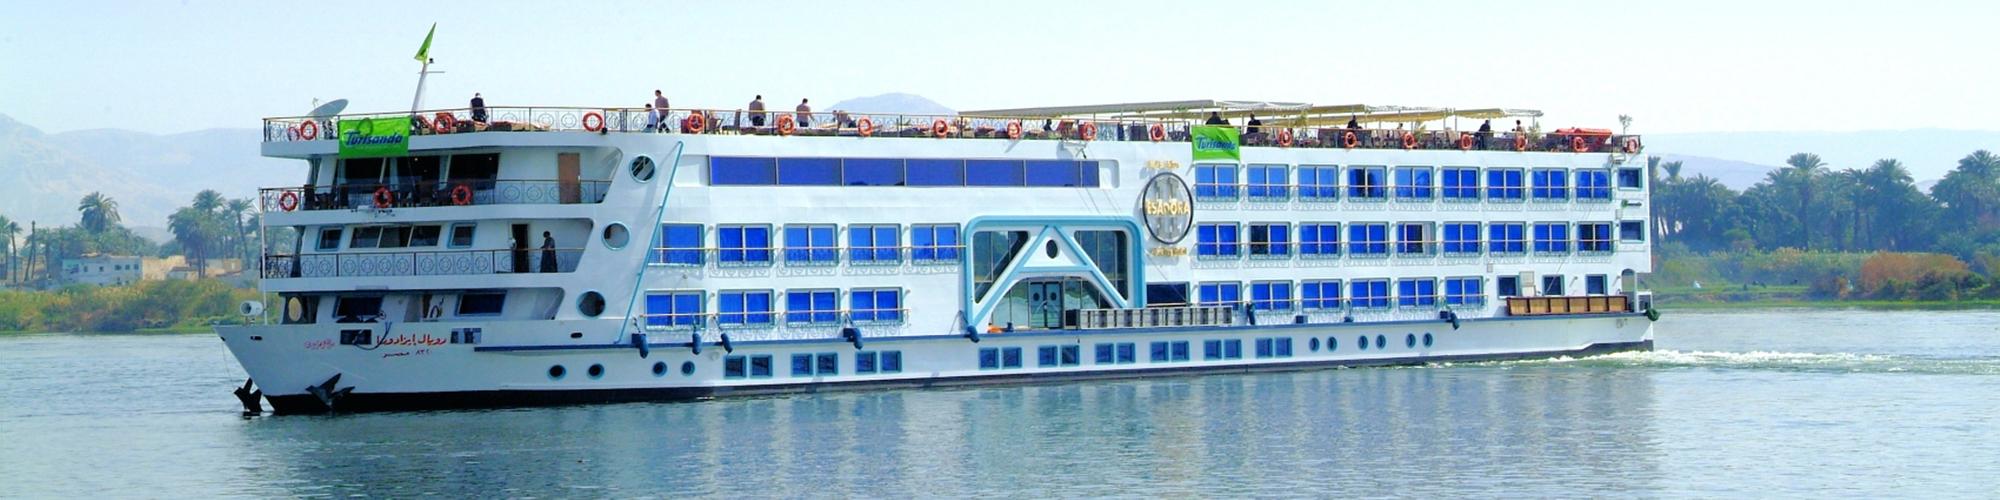 Nile Cruise Tours From Port Ghalib - Port Ghalib Nile Cruise Tours - Tours From Hurghada